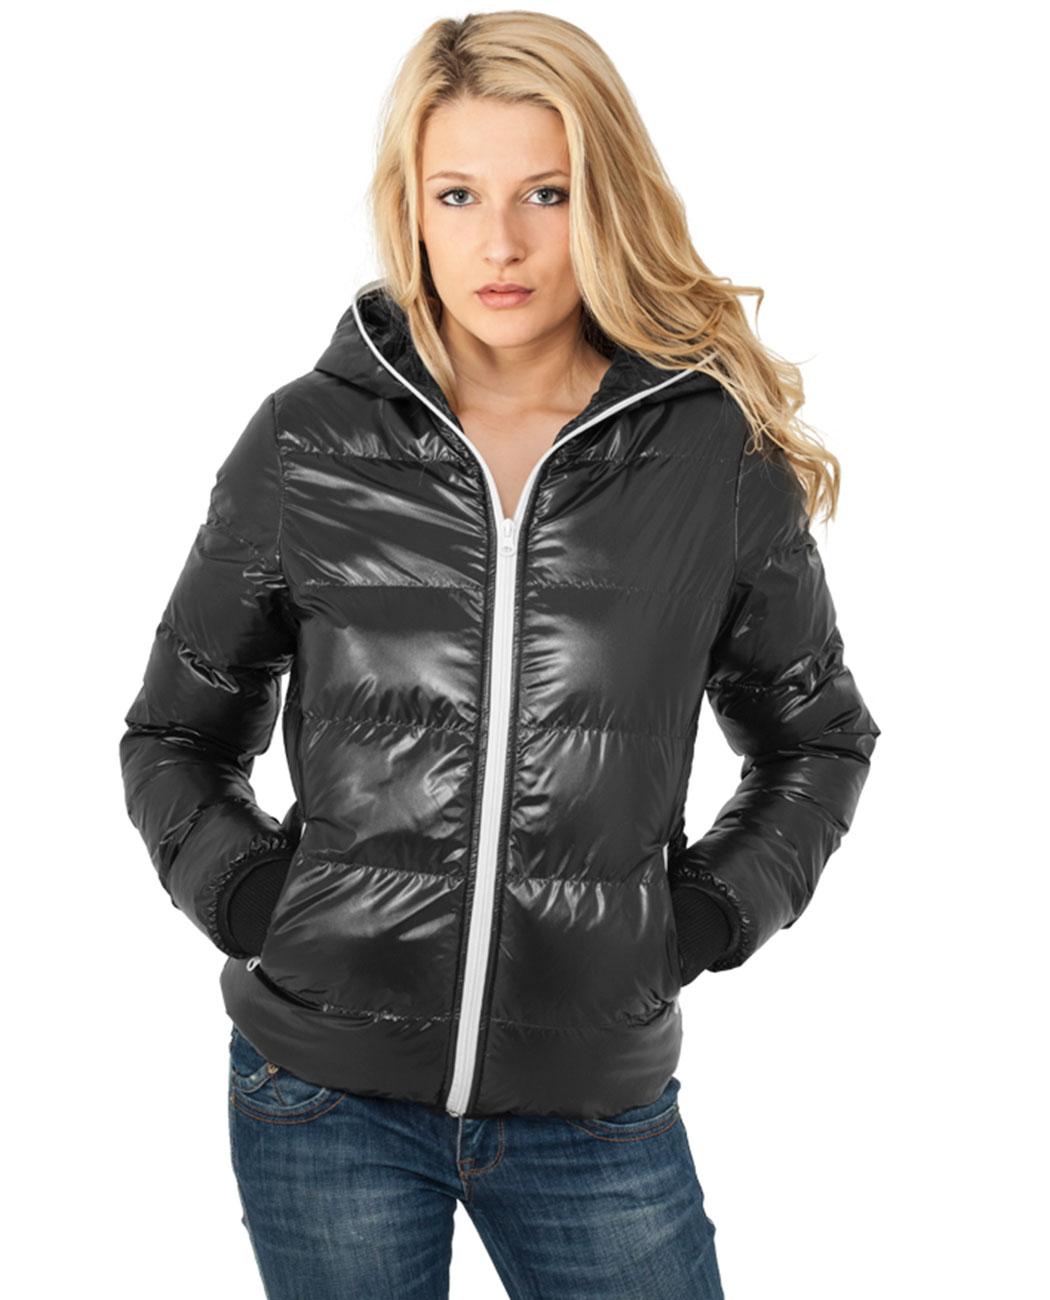 Urban Classics Dámská lesklá zimní bunda s kapucí URBAN CLASSICS TB618 Černá / Bílá XS